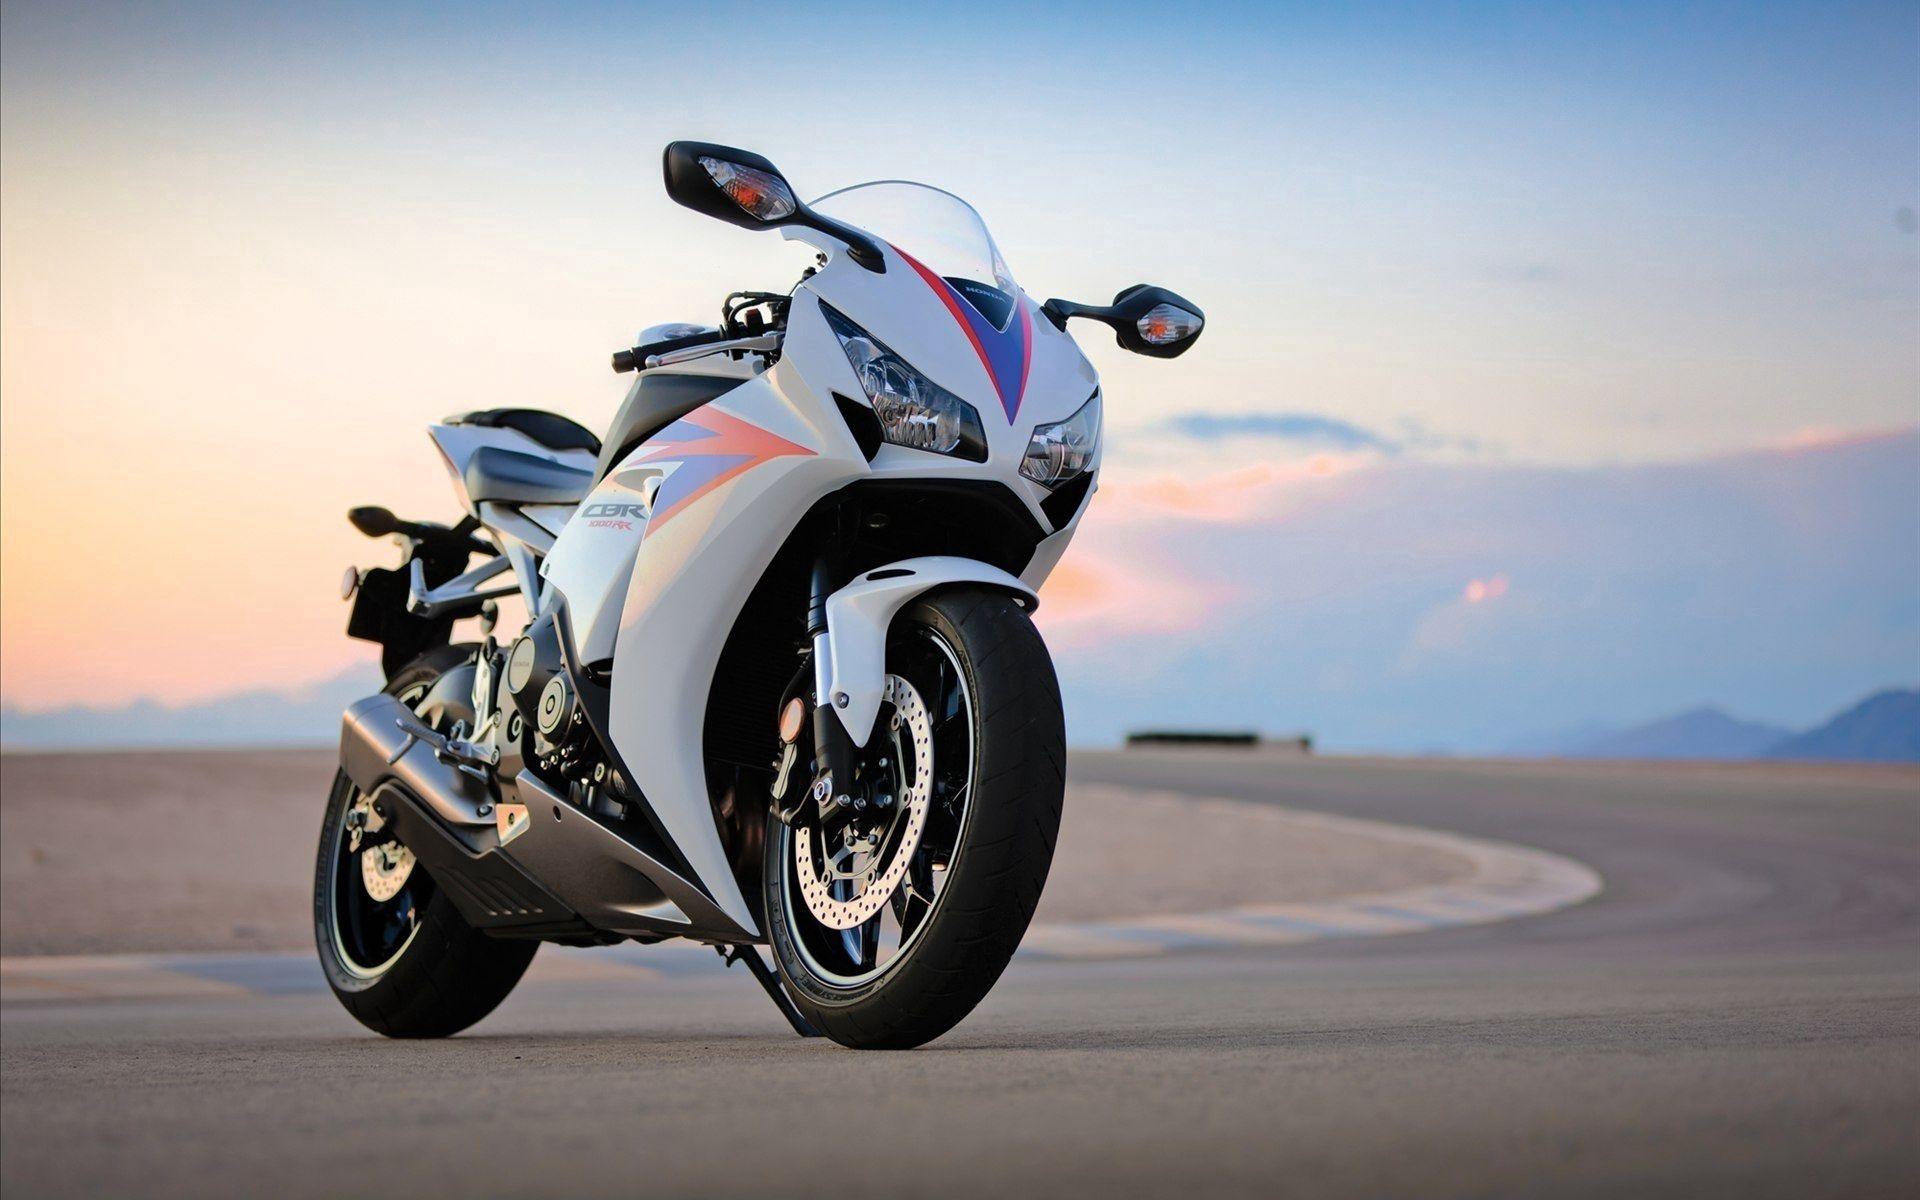 51597 Hintergrundbild herunterladen Motorräder, Honda, Motorrad, Cbr, 1000Rr, 2012 - Bildschirmschoner und Bilder kostenlos